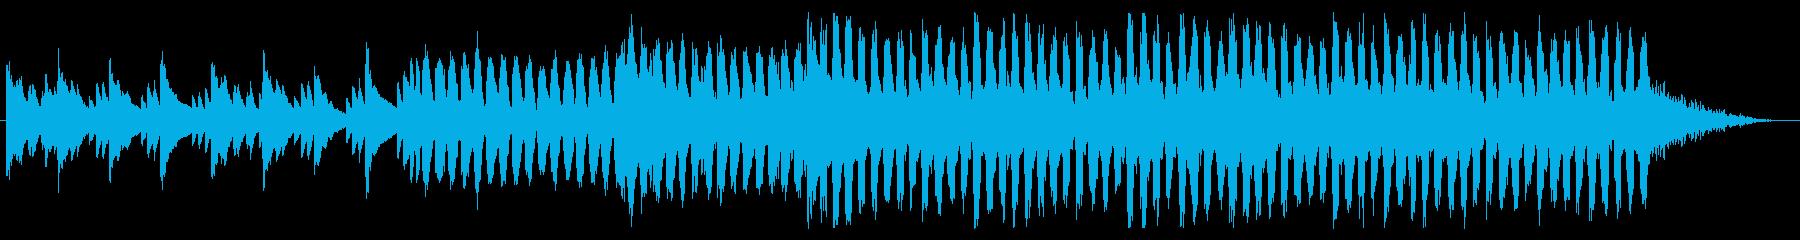 【EDM】ドライブする時に流れてそうな曲の再生済みの波形